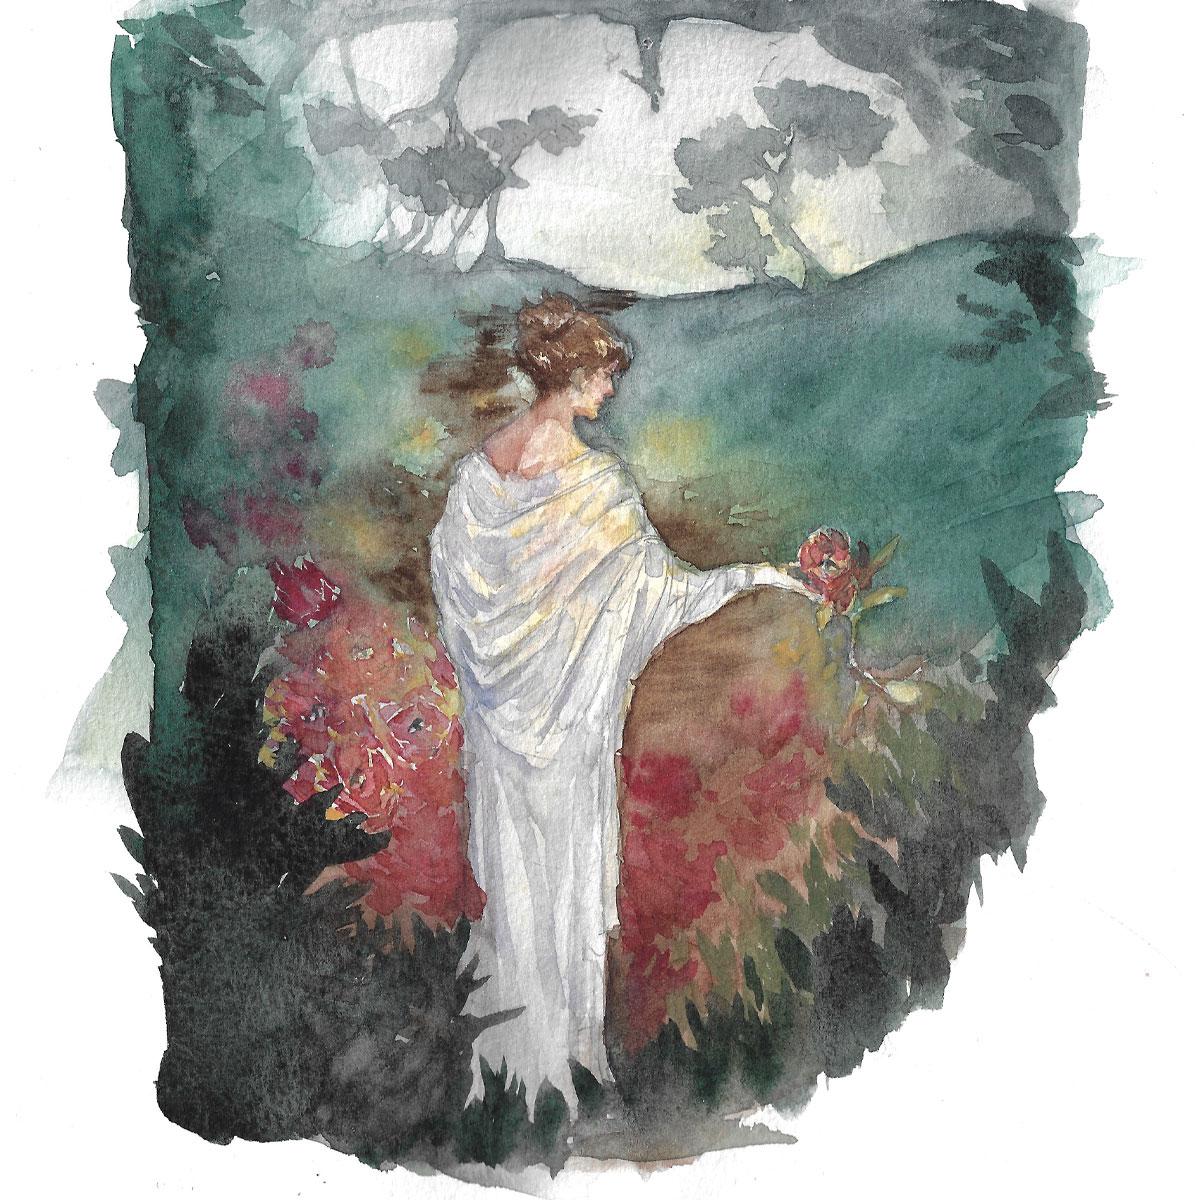 Illustration - 1 - Apolline Beauchamp